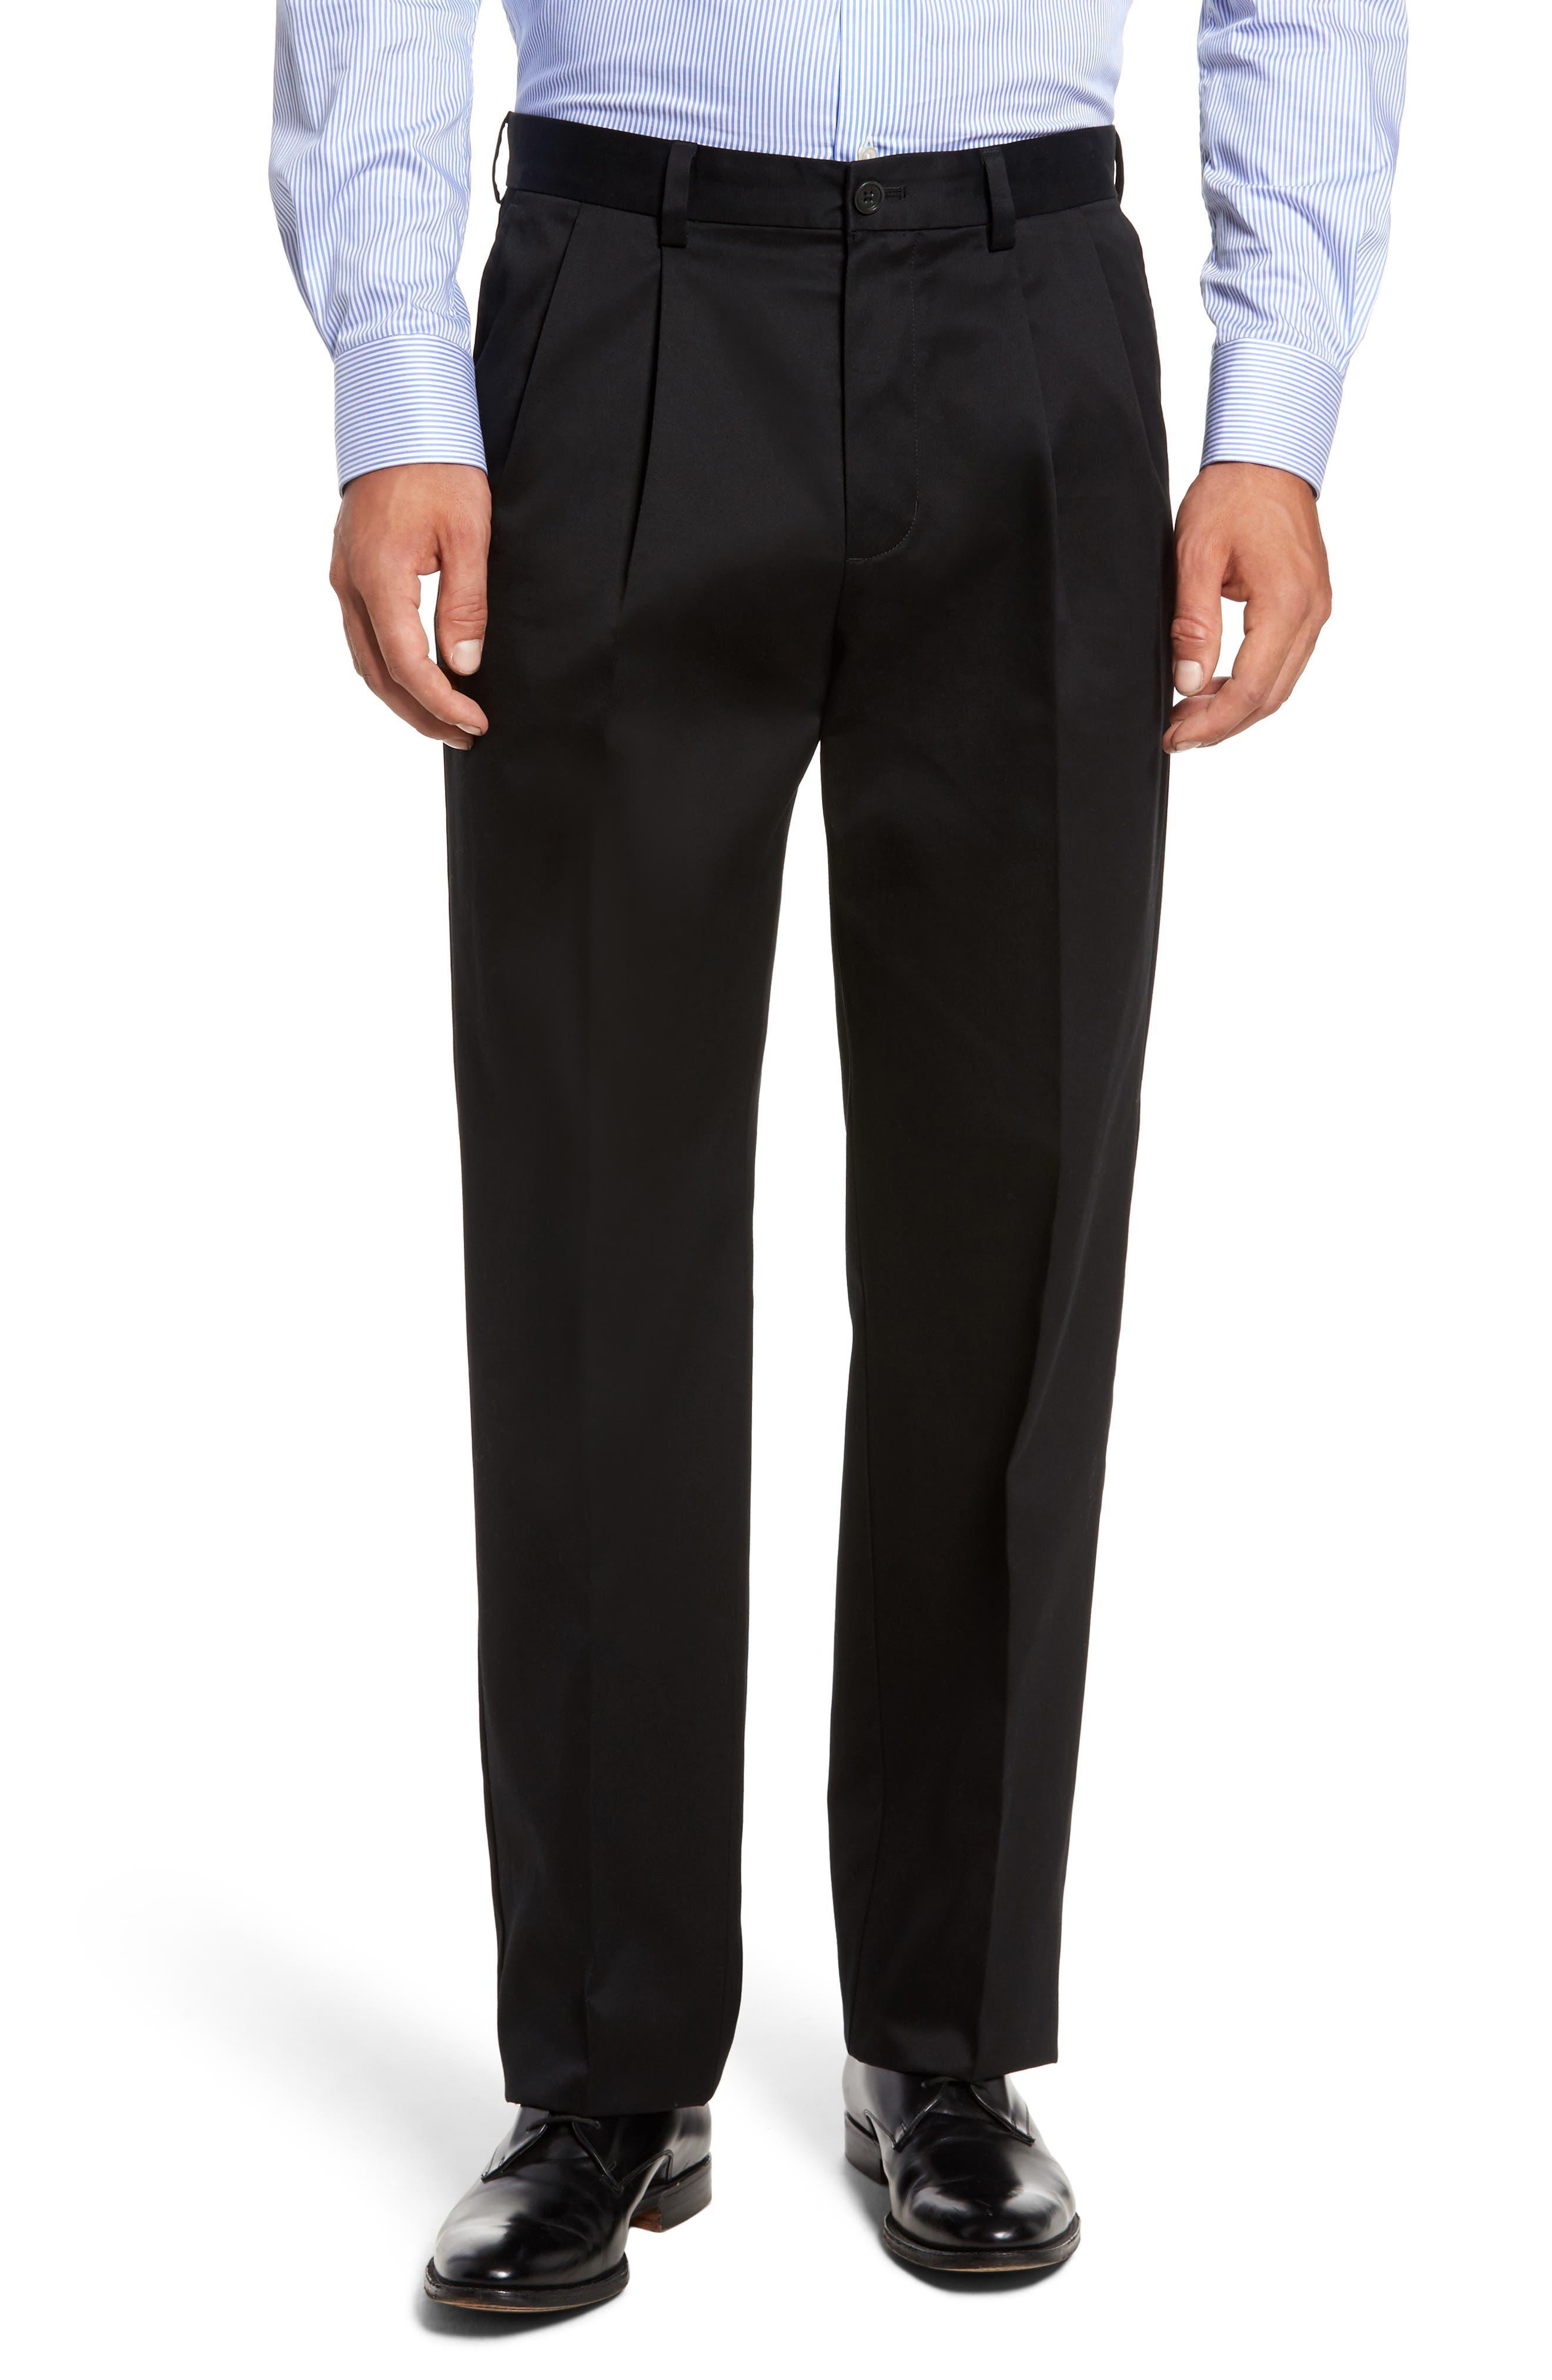 NORDSTROM MEN'S SHOP 'Classic' Smartcare<sup>™</sup> Relaxed Fit Double Pleated Cotton Pants, Main, color, BLACK